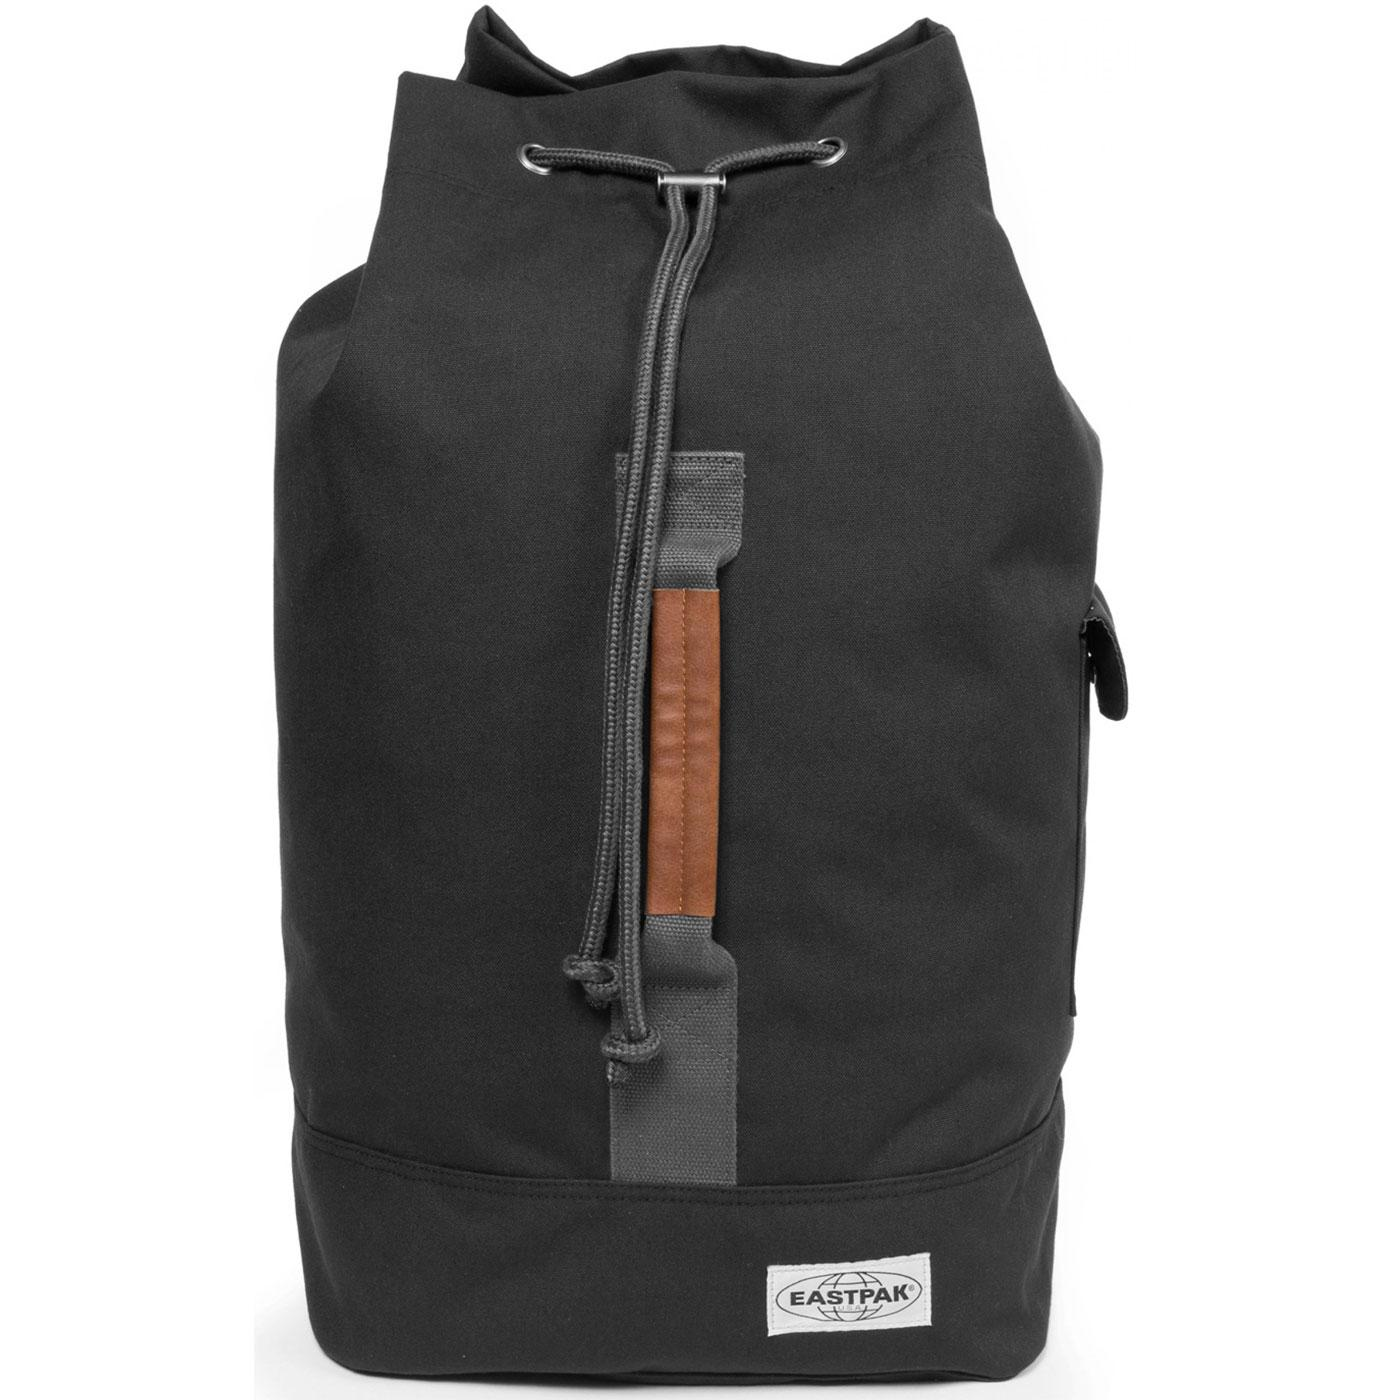 EASTPAK Plister Authentic Military Duffle Bag (OD)